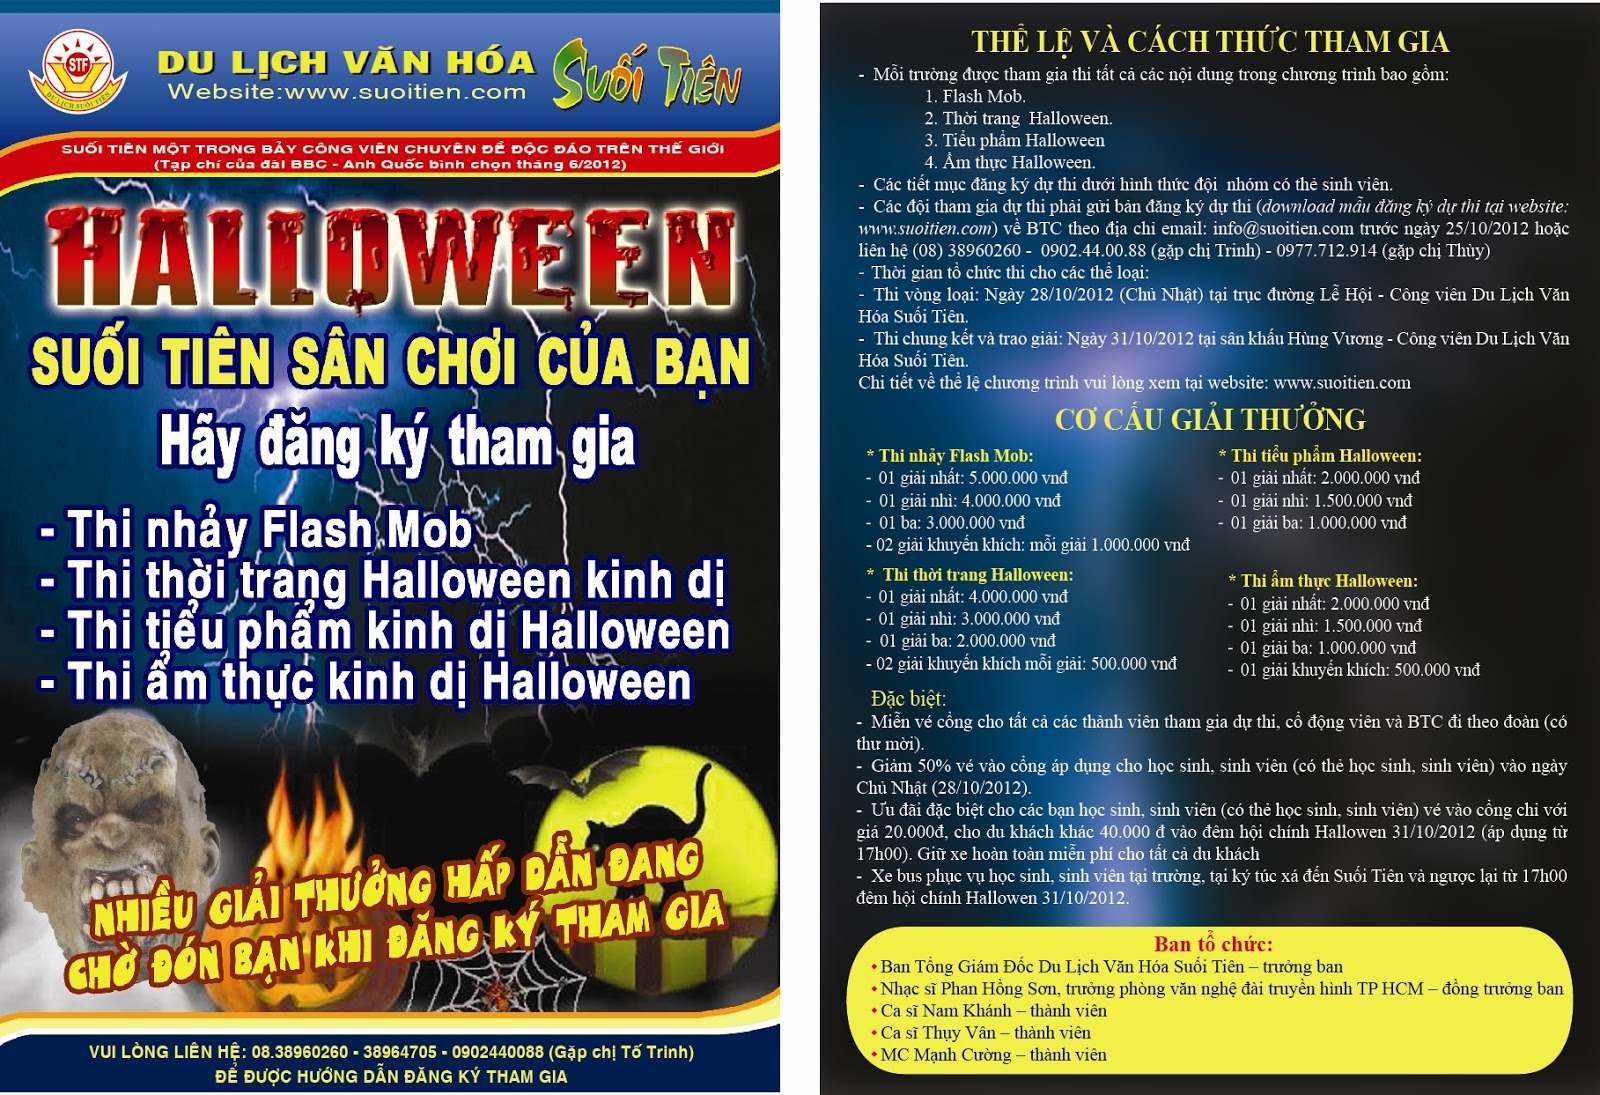 Lễ hội Halloween 2012 - Suối tiên